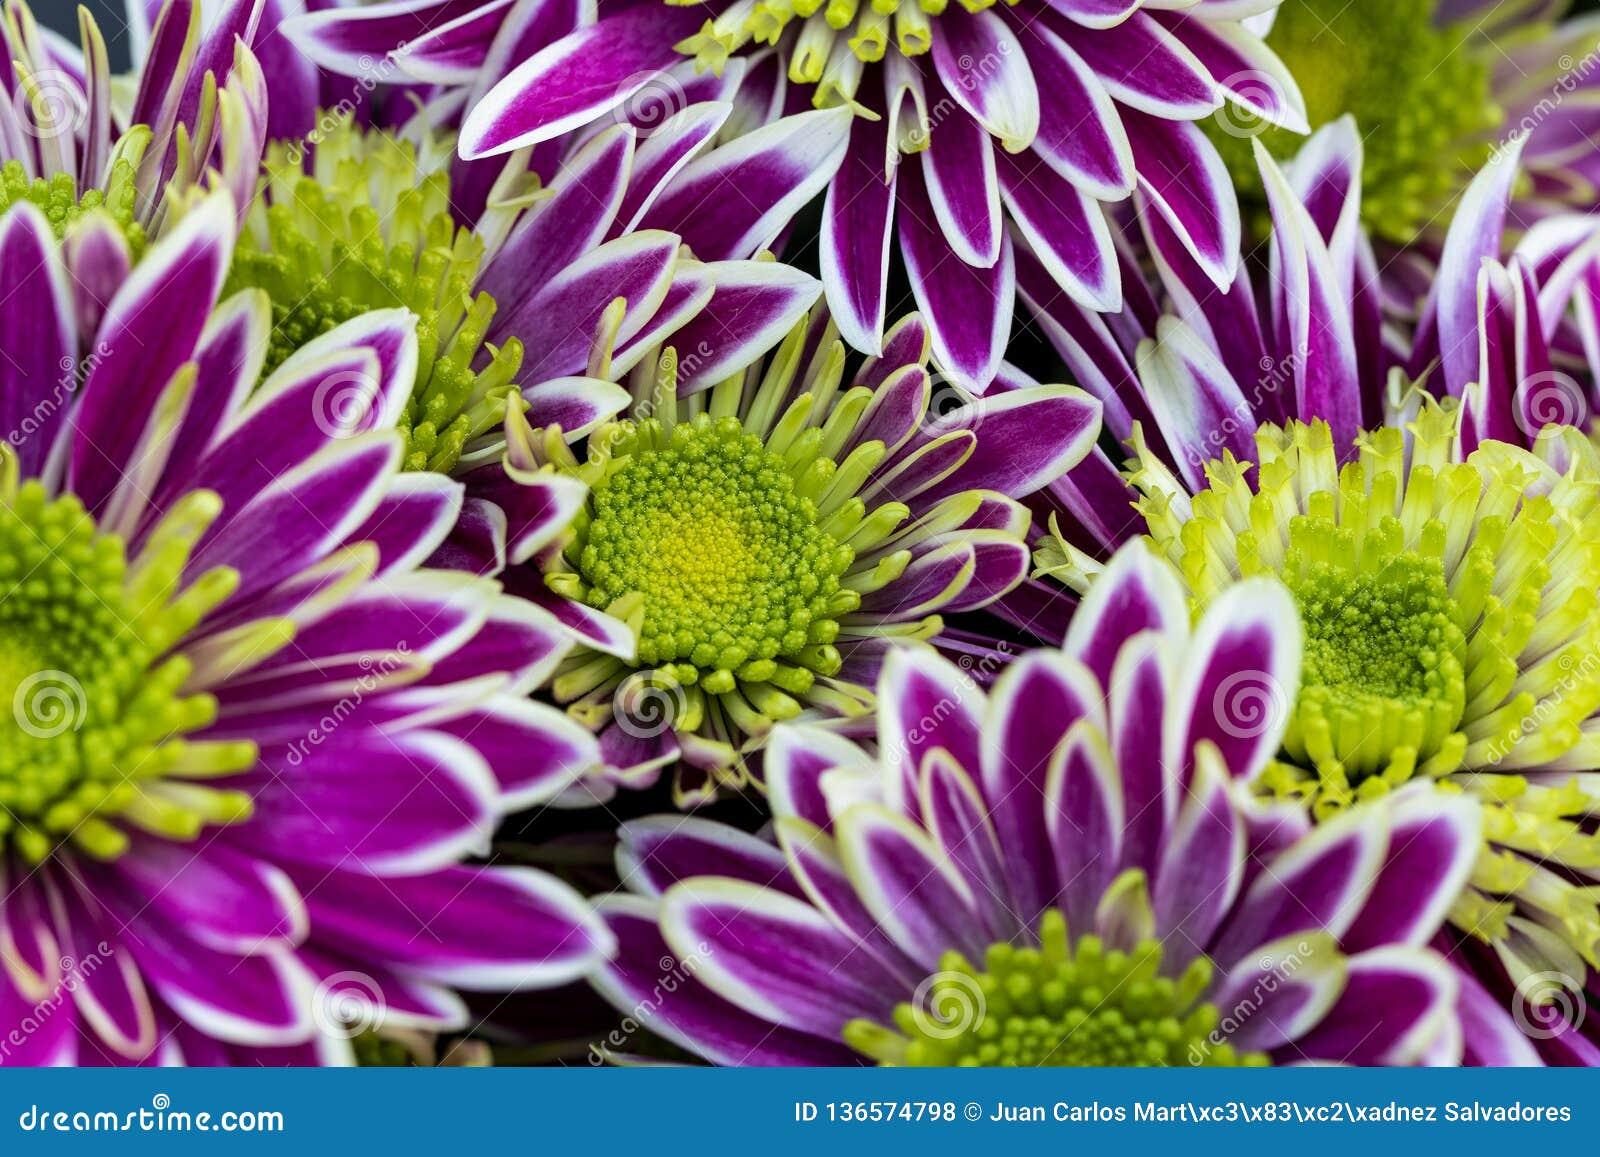 Gemeinsame Chrysanthemum Indicum With Purple And White Flower Stock Photo &JR_02